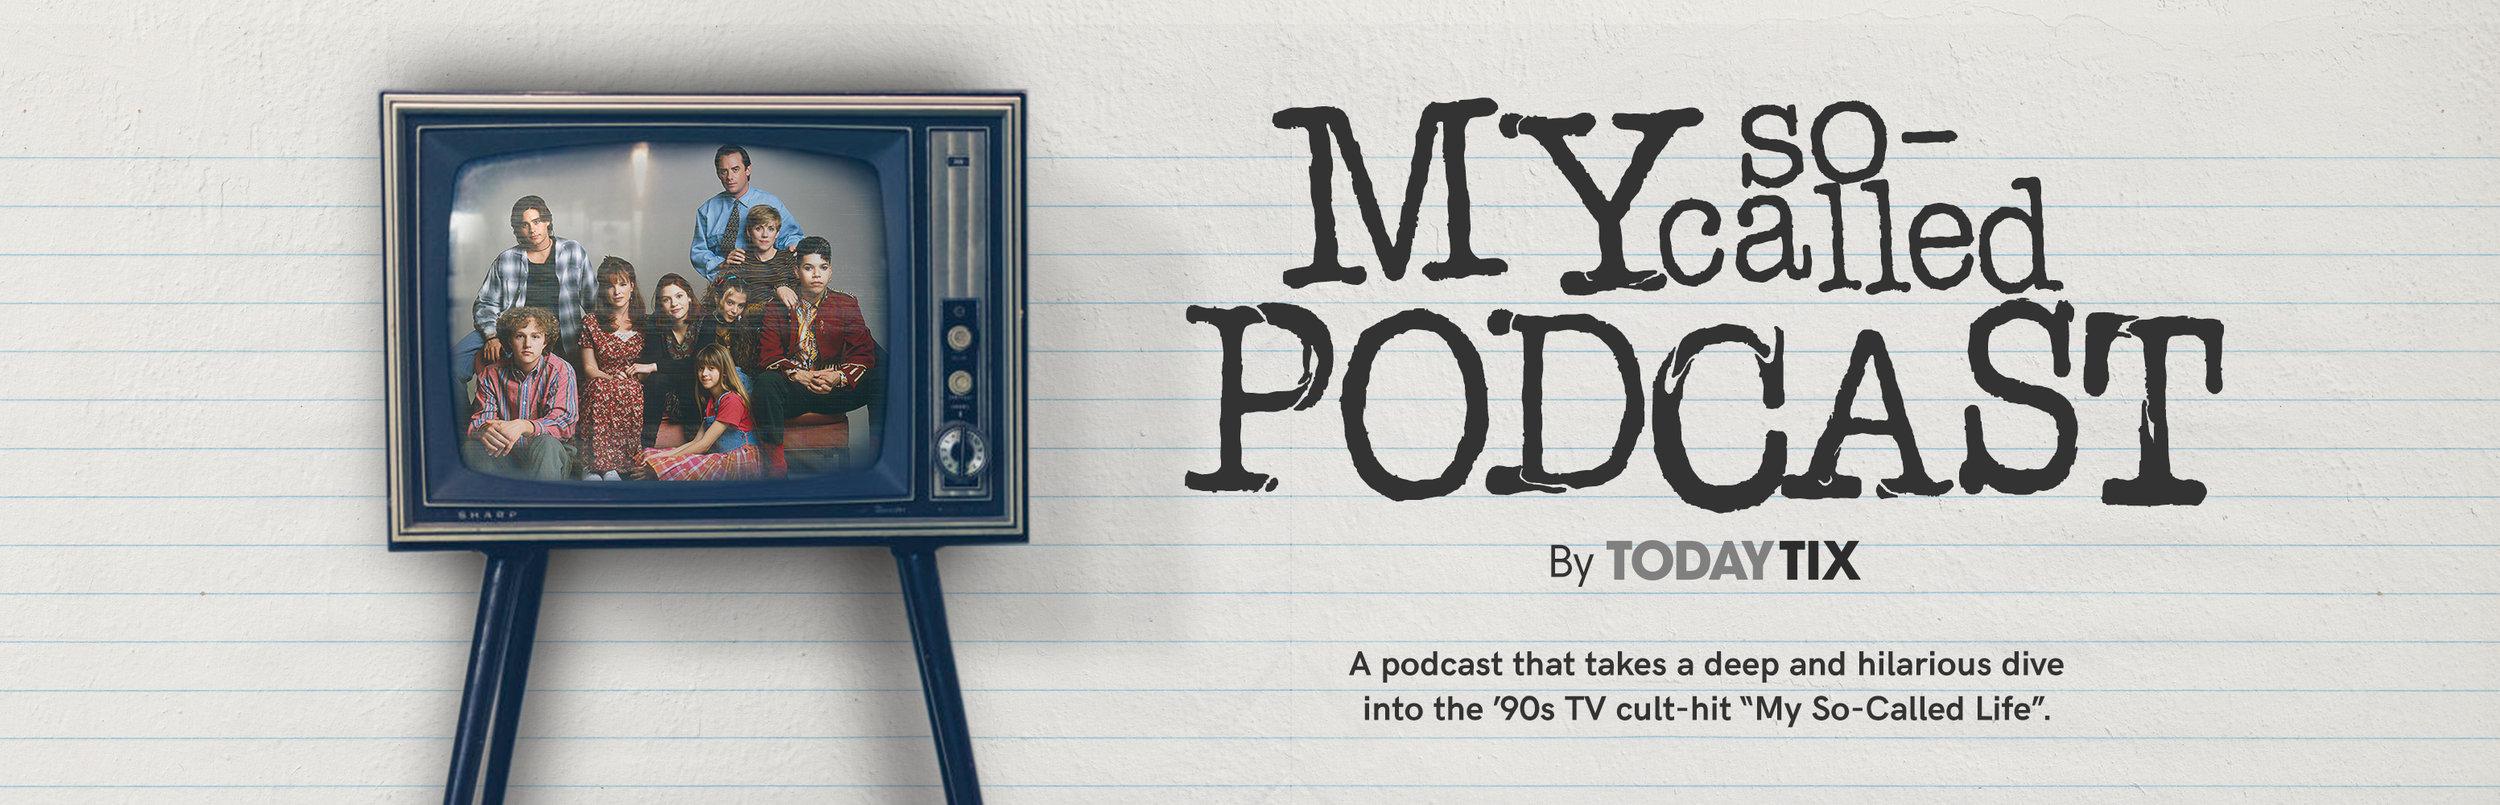 My So Called Podcast Update.jpg